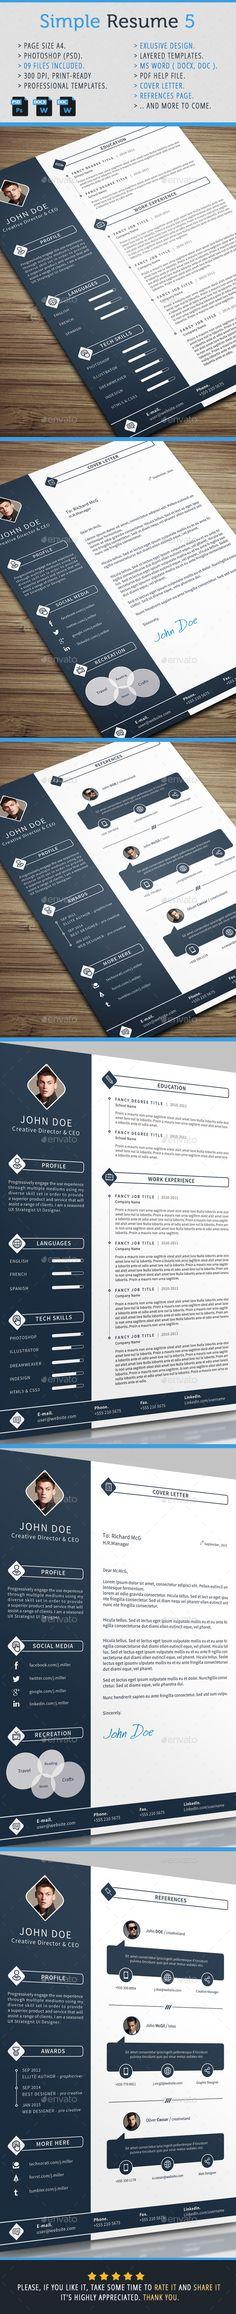 Simple Resume Template #design Download: http://graphicriver.net/item/simple-resume-5/10352706?ref=ksioks